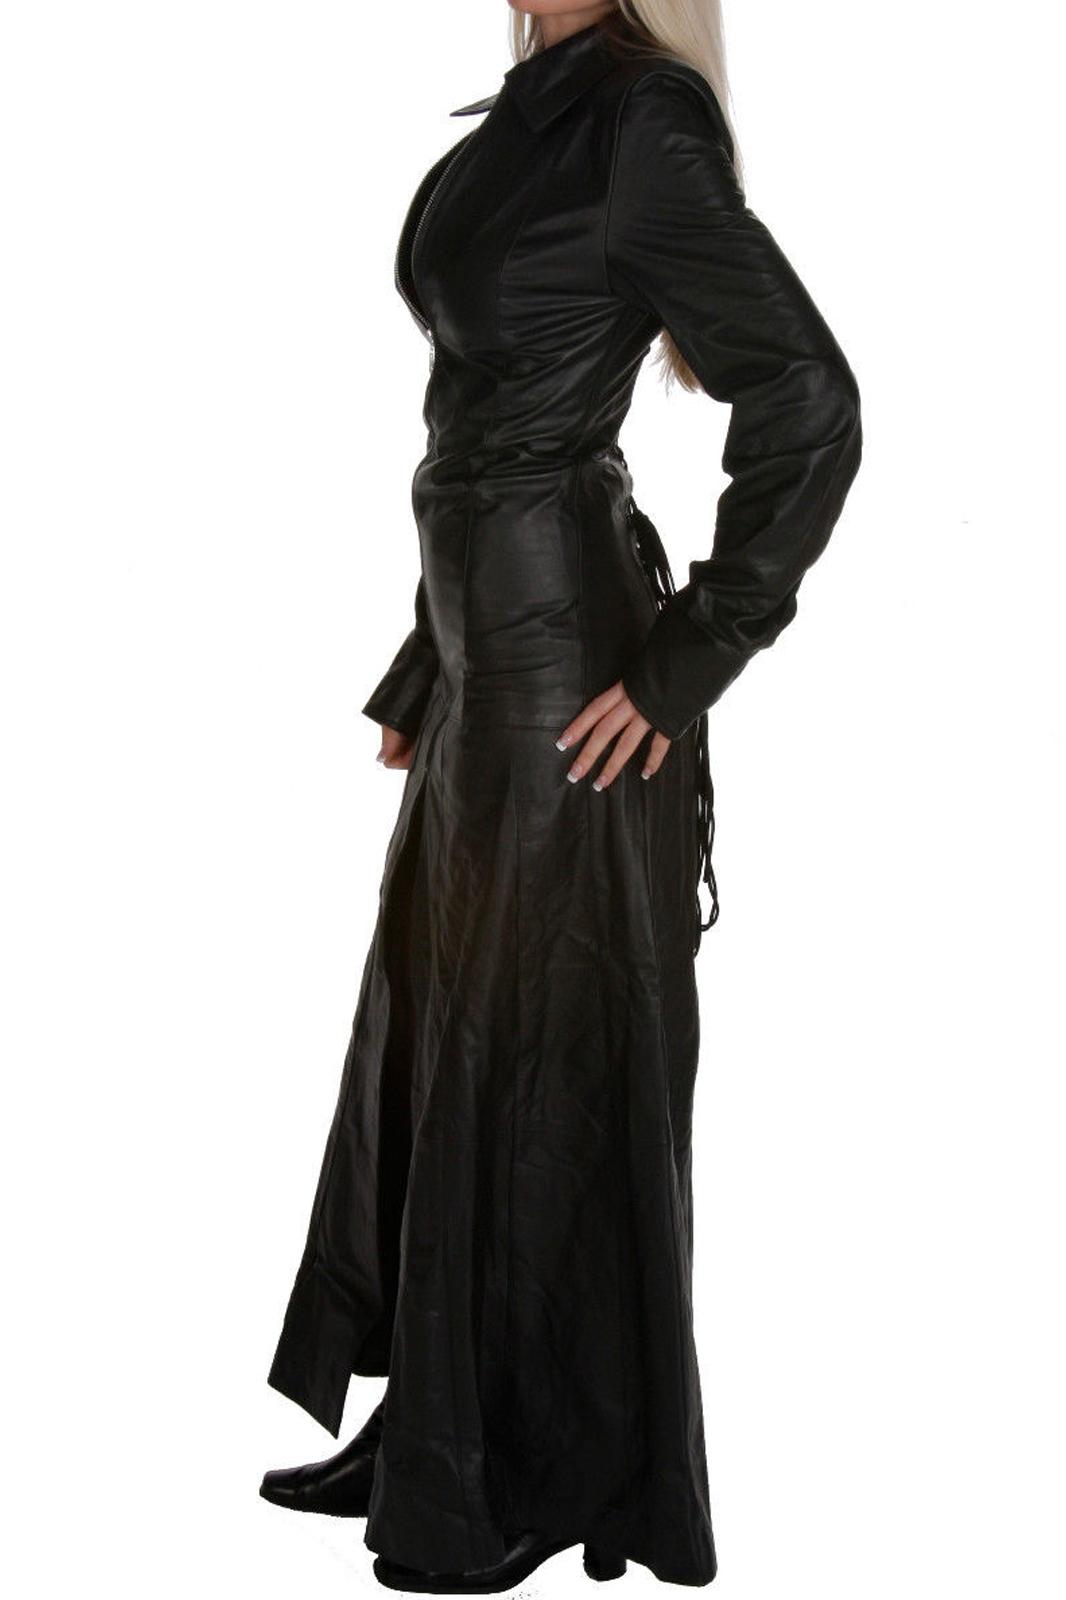 rebelsmarket_women_log_gothic_coat_genuine_leather_fashion_front_zipper_coat_dress_coats_4.jpg